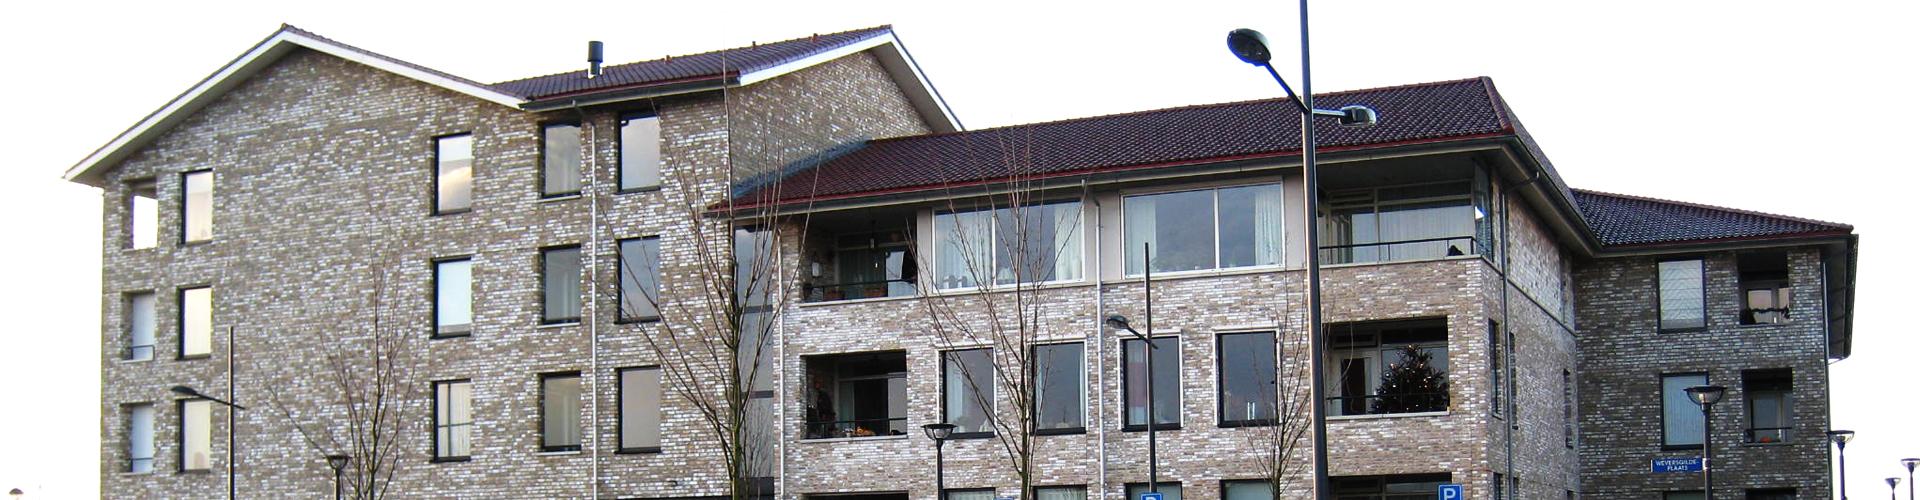 Weversgildeplaats Culemborg